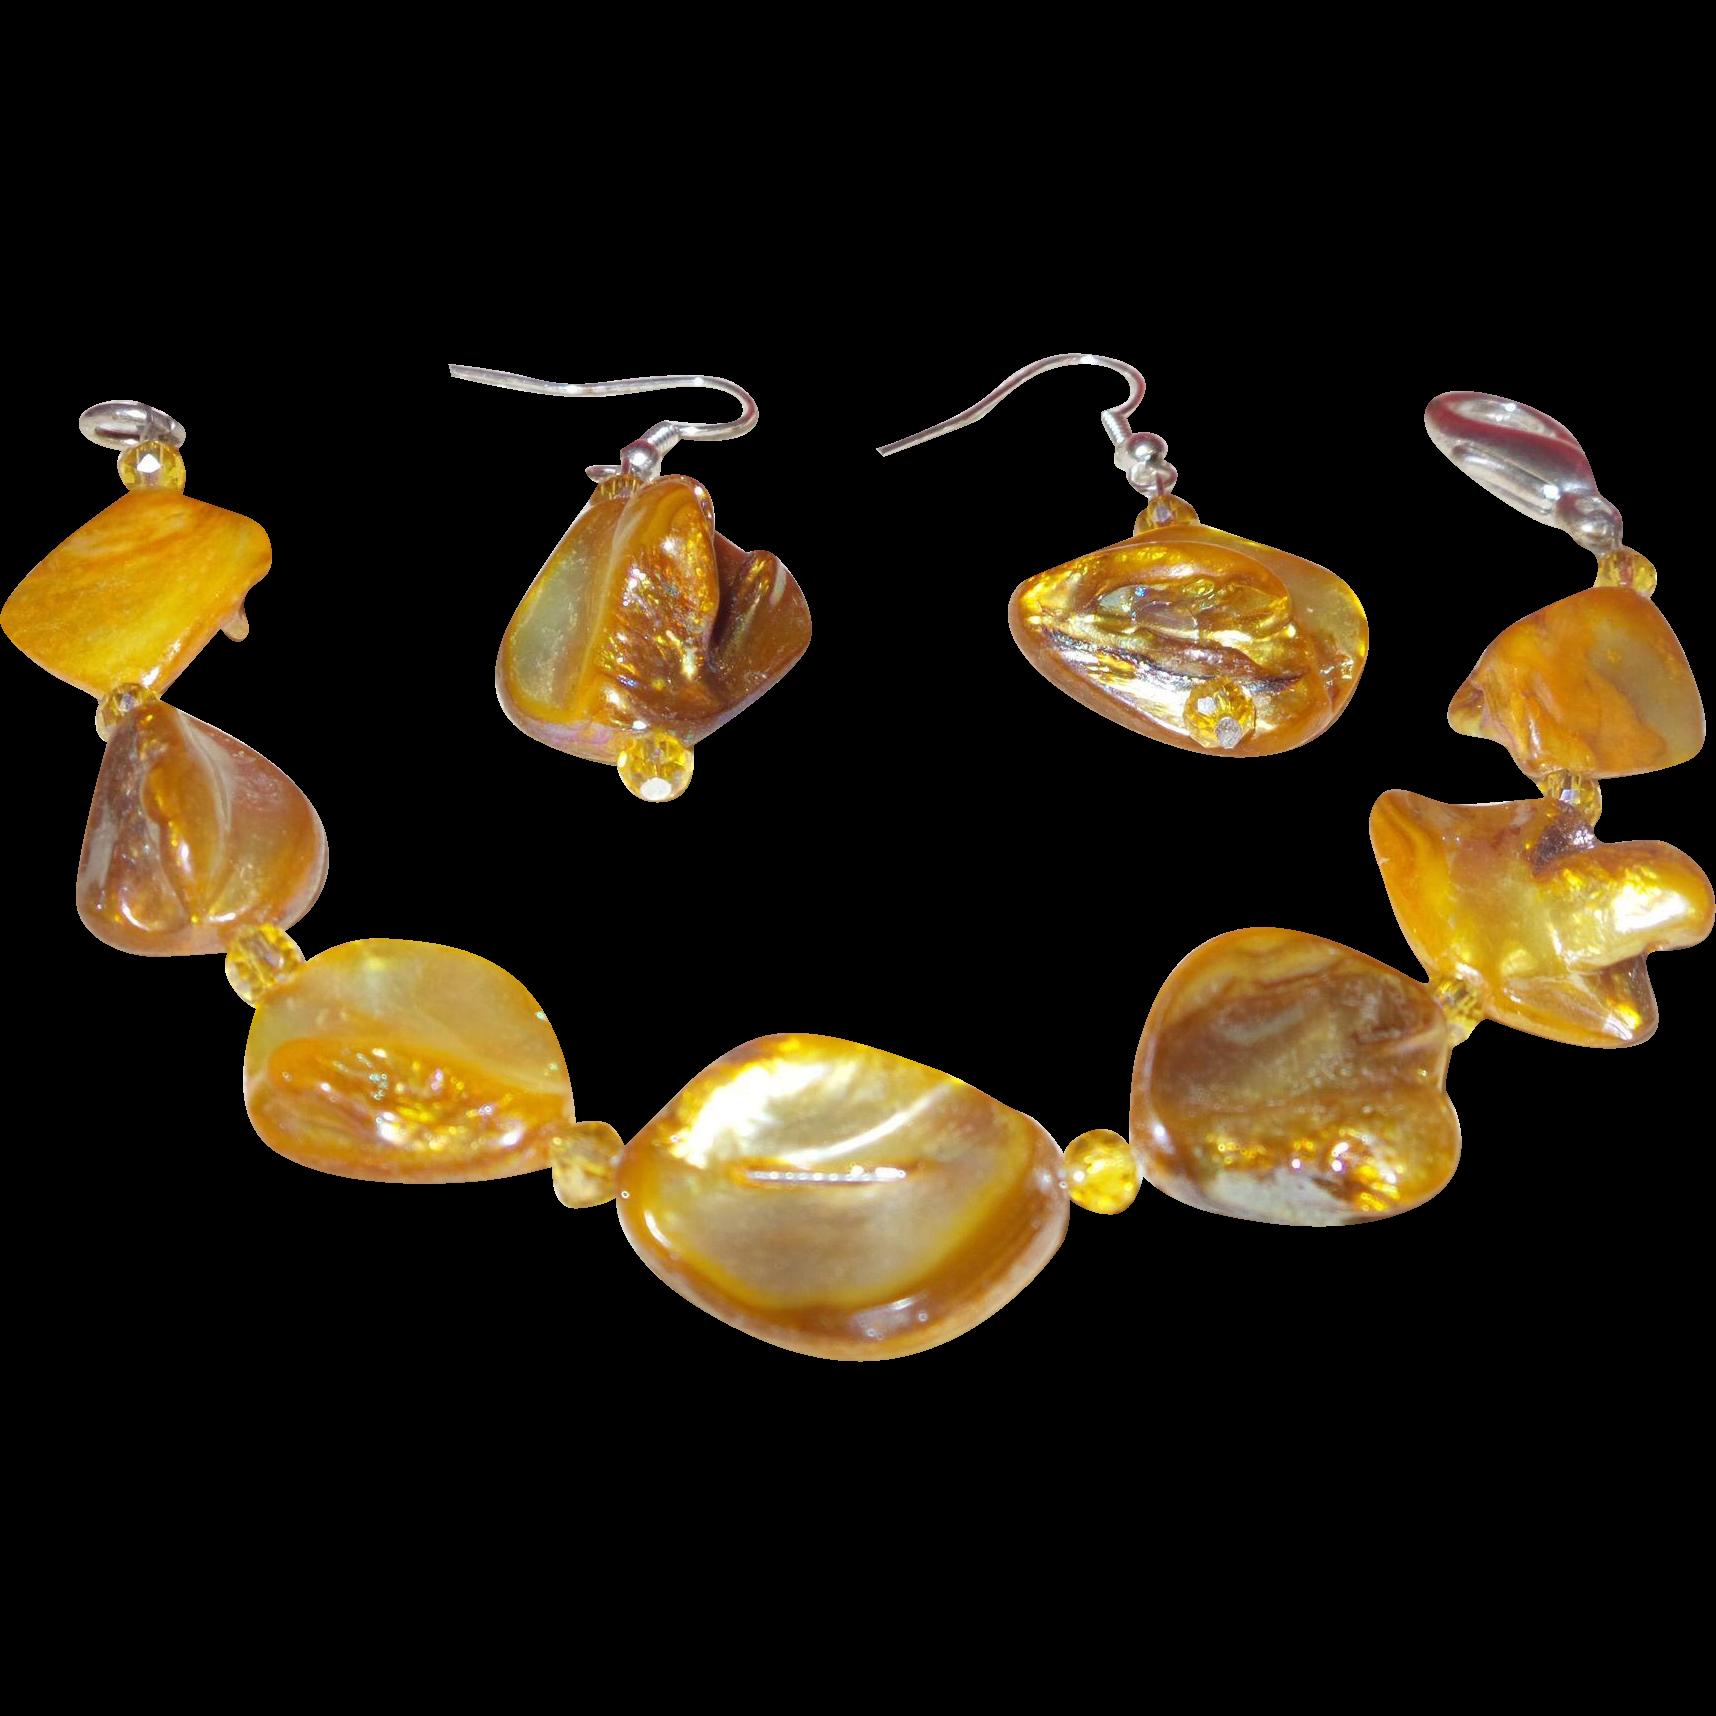 Artisan Earrings : Artisan dyed abalone shell bracelet with earrings from